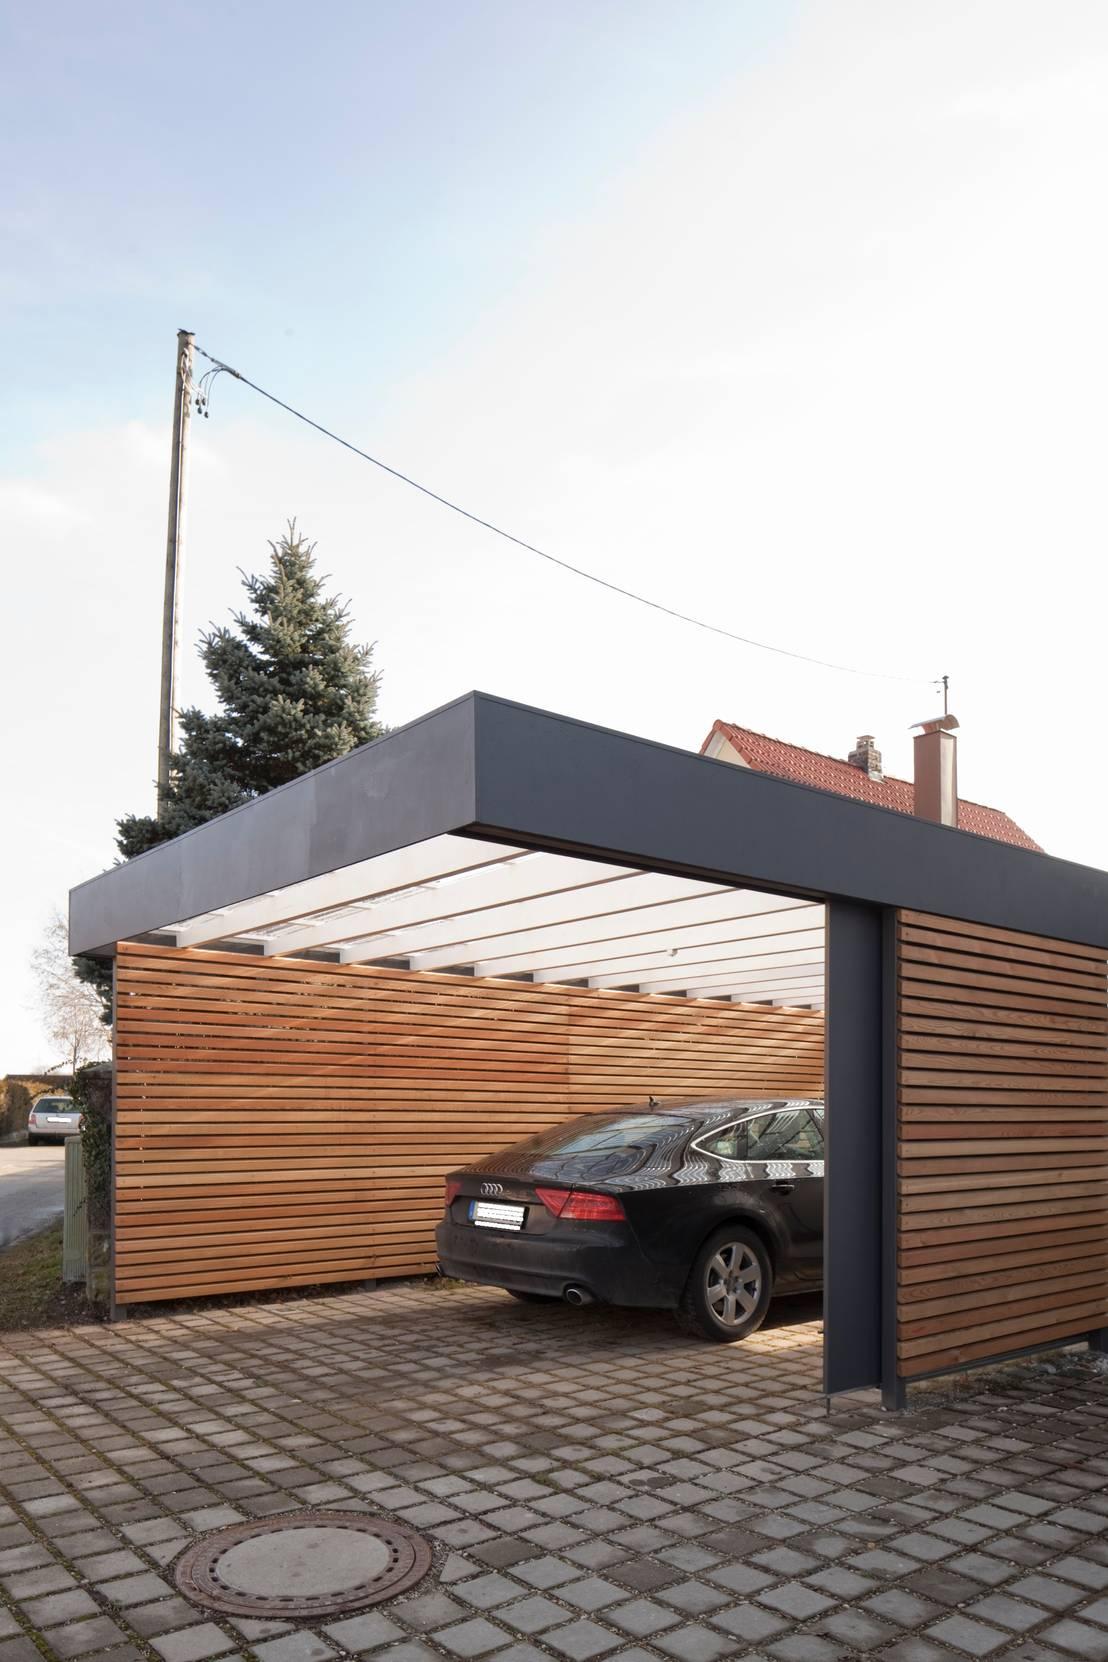 Hängele Küche carport architekt armin hägele homify